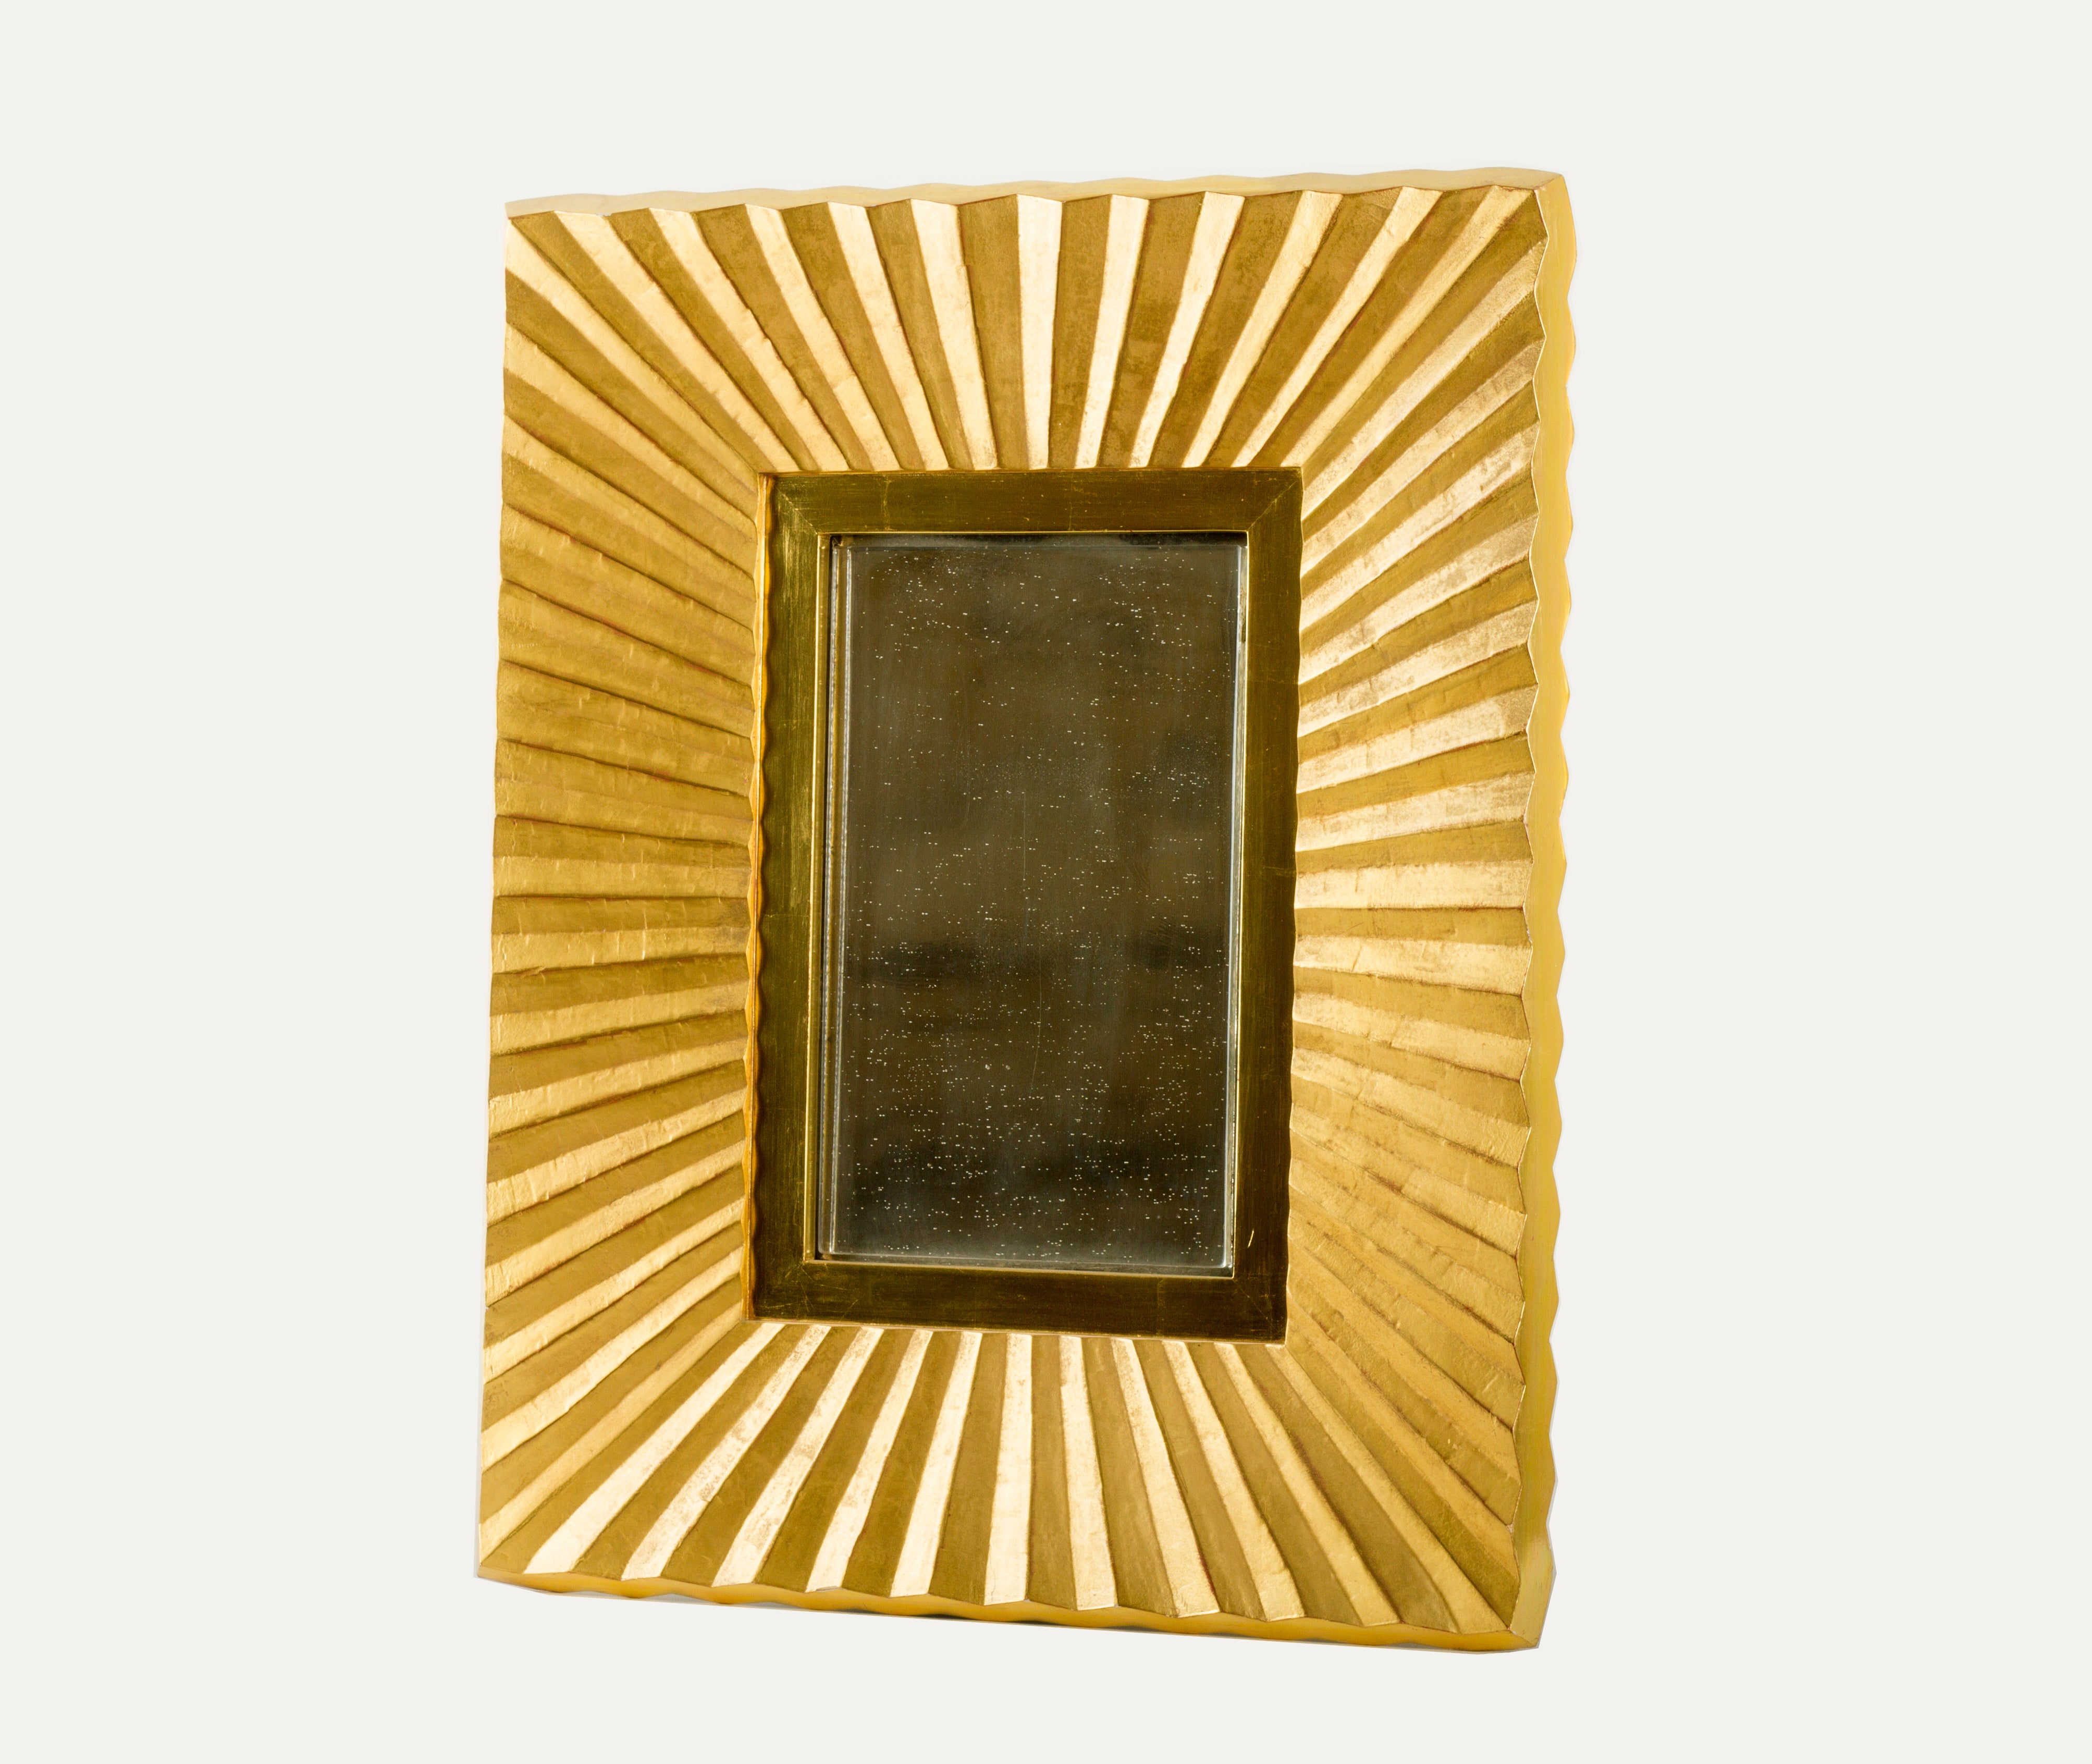 Bark Frameworks 23 Karat Gold Pleated Wall Mirror, Designed By Jared